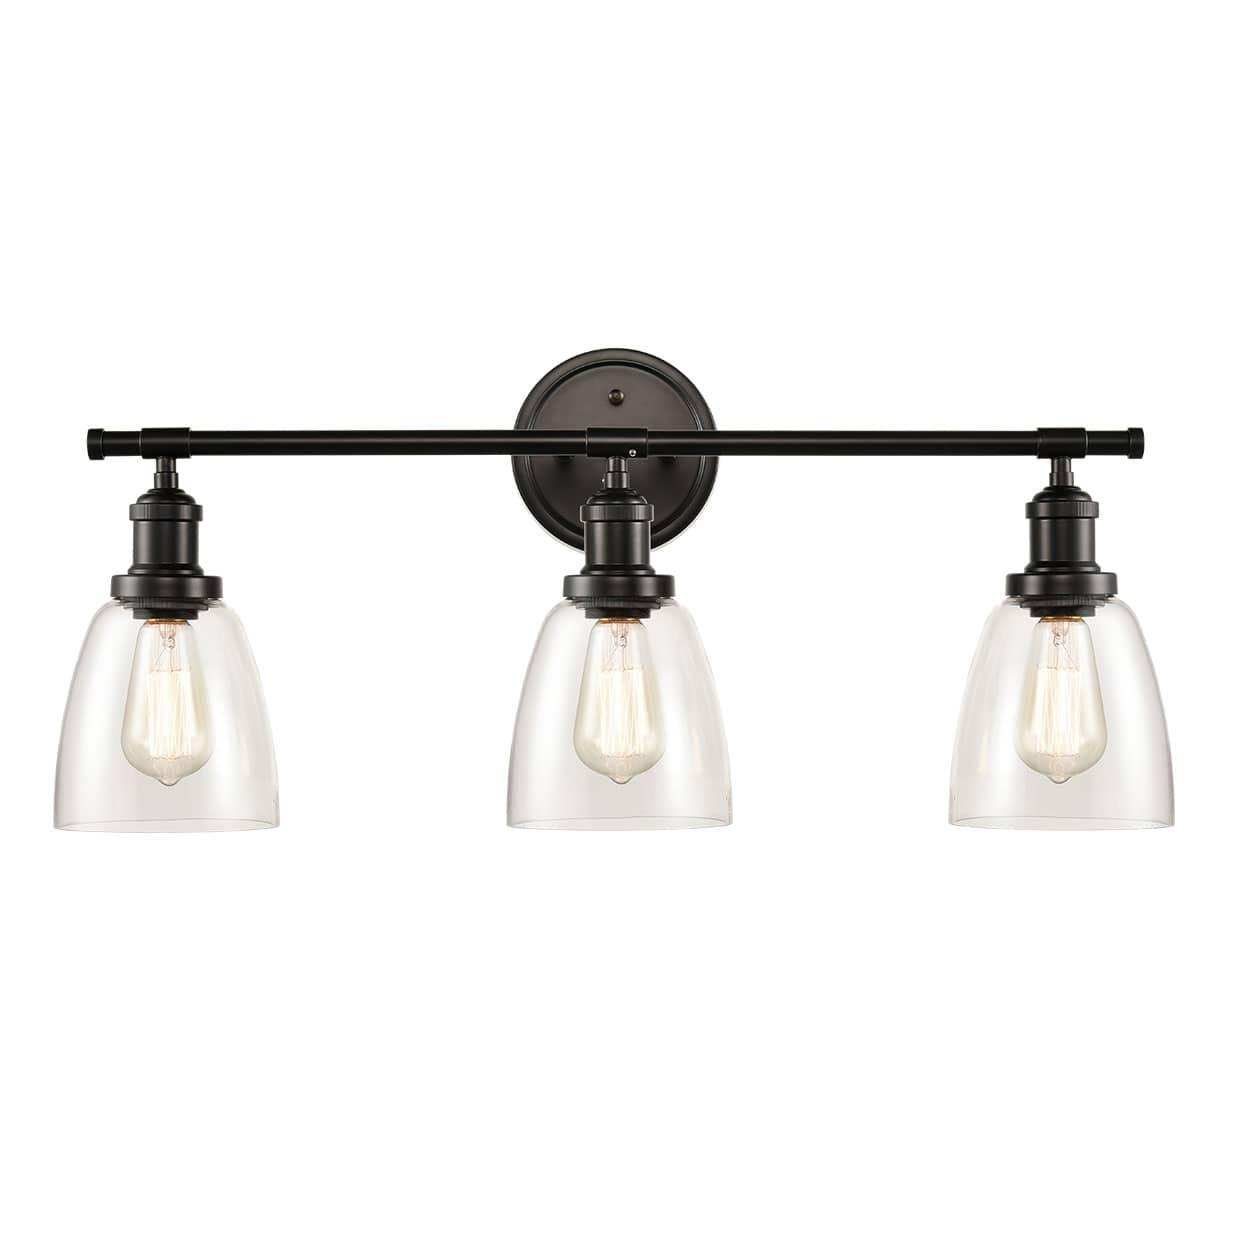 Industrial 3 Light Bathroom Vanity Lighting Black Wall Sconces